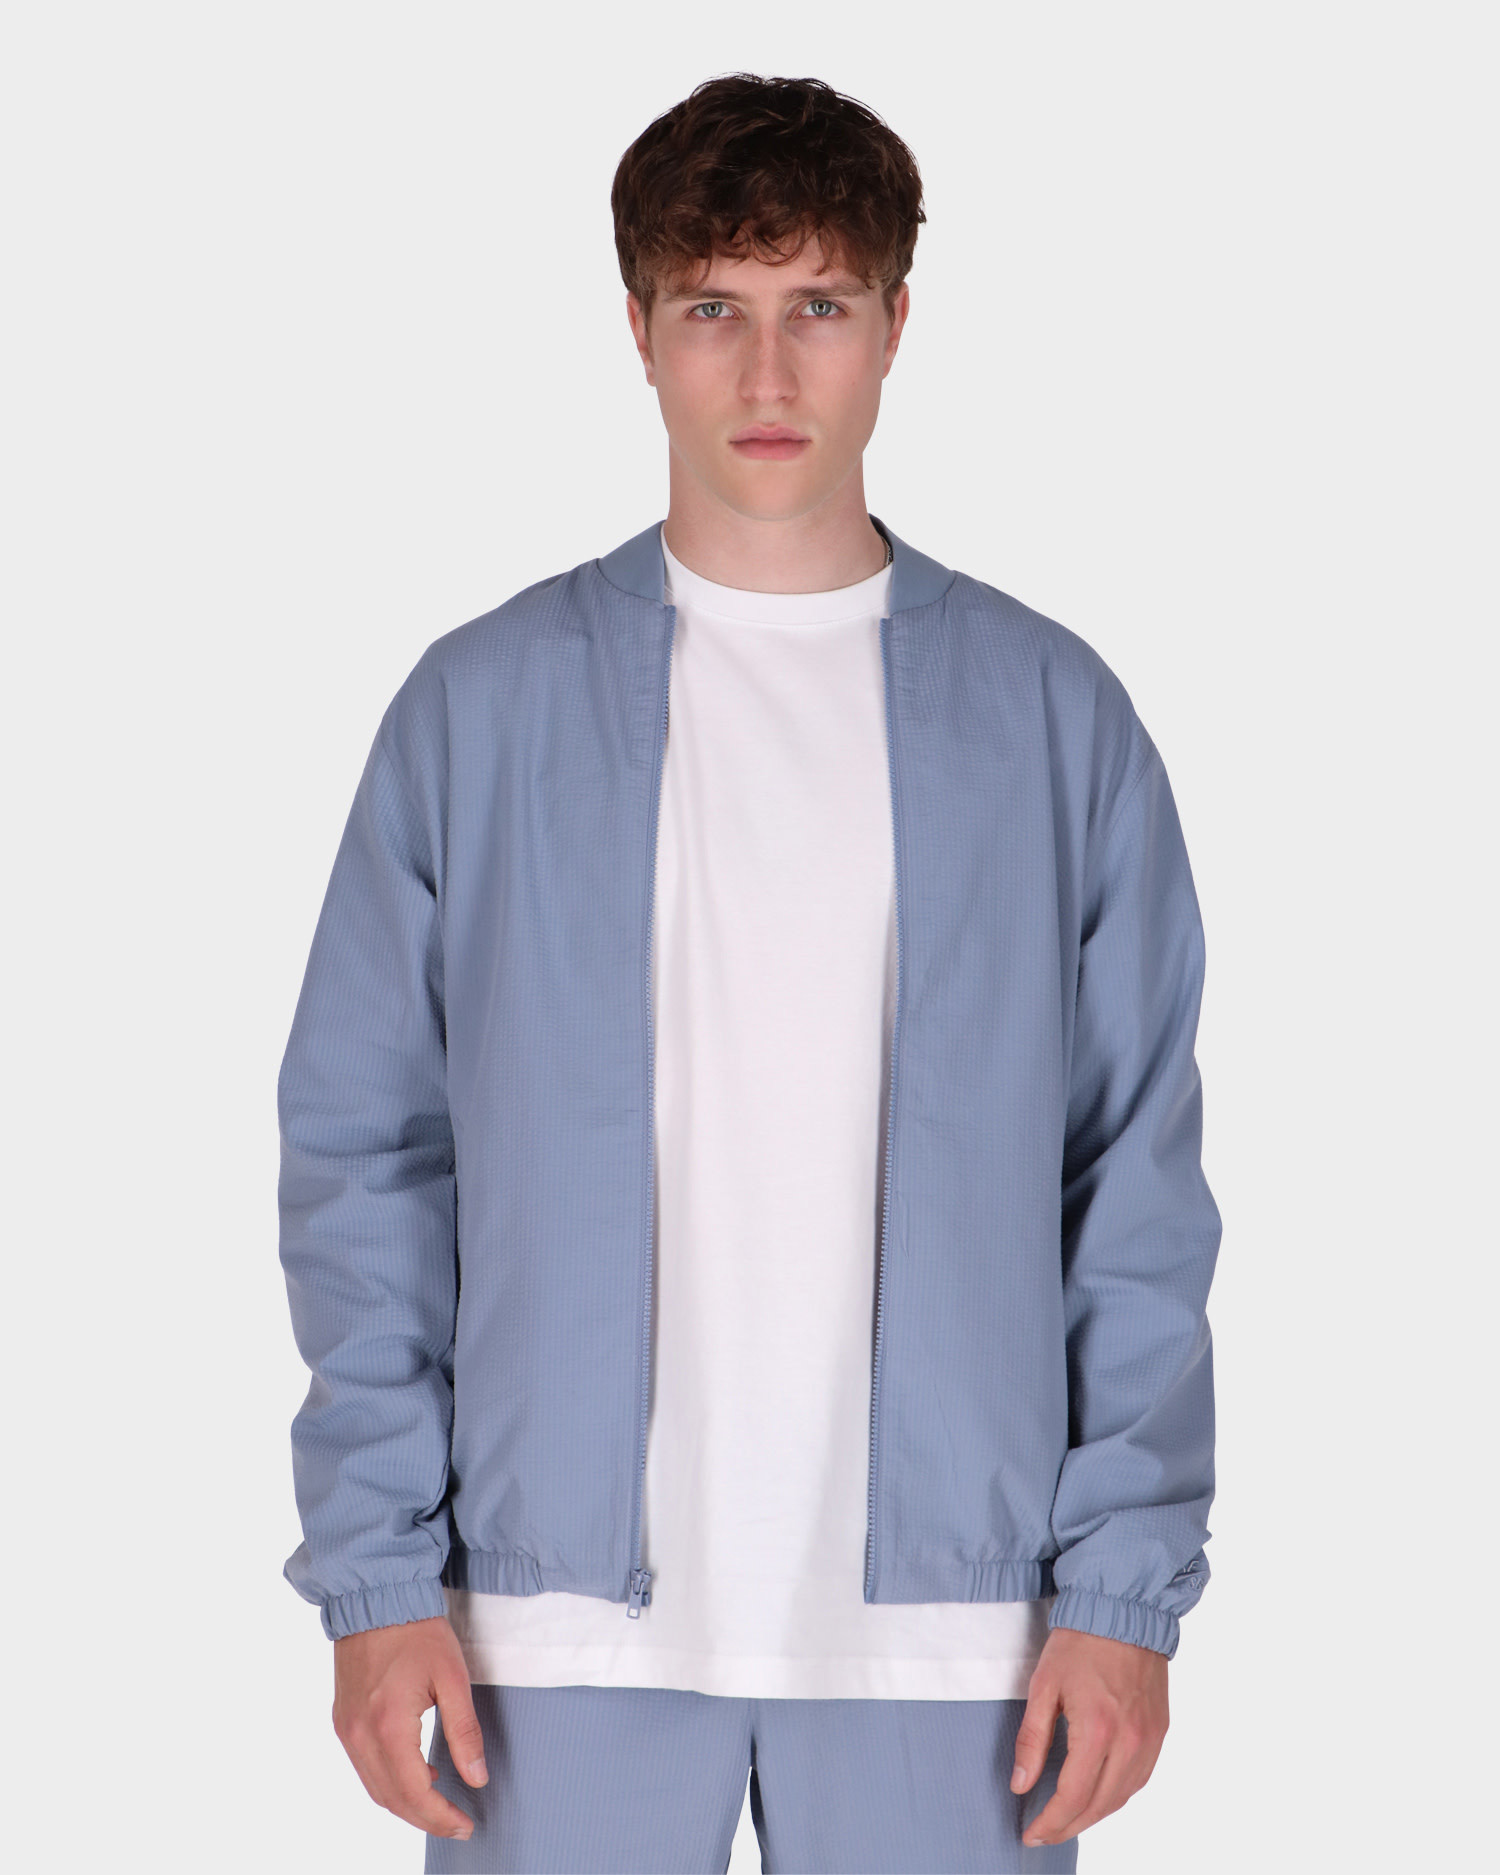 Nike SB Skate Jacket  Ashen Slate/Blue